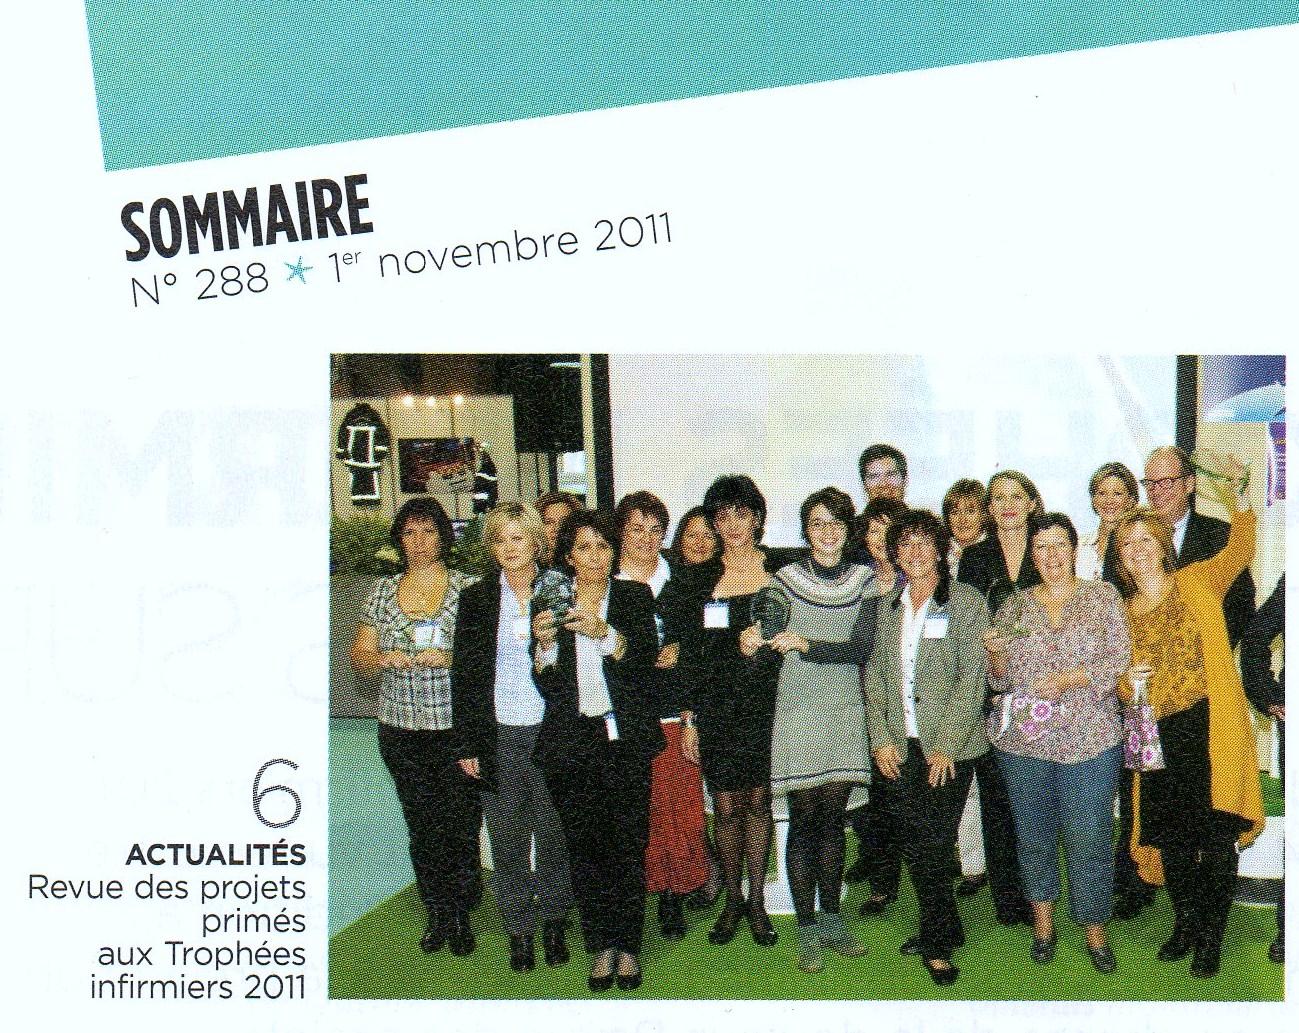 http://static.onlc.eu/ateliers-safranNDD//132492503390.jpg